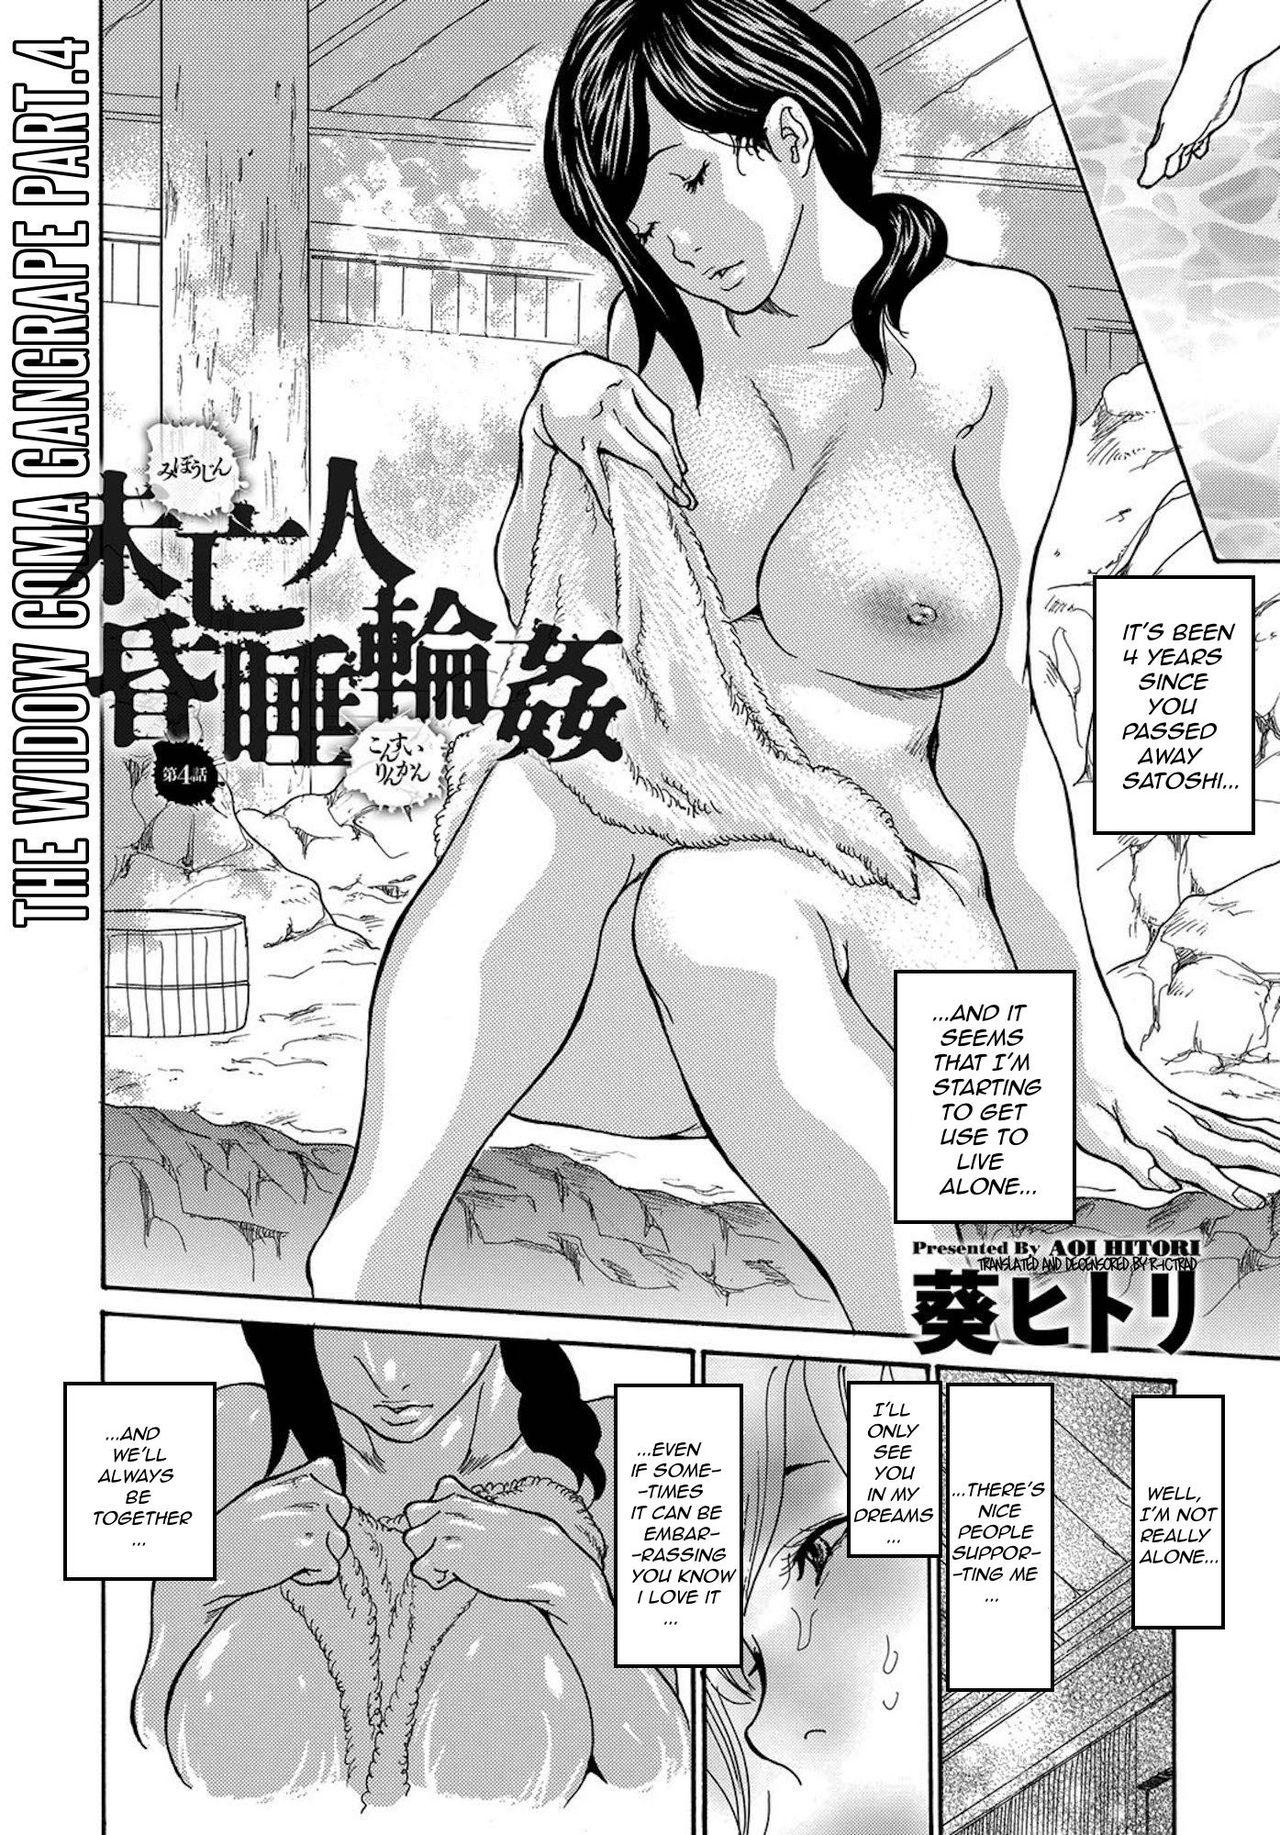 Miboujin Konsui Rinkan   The Widow Coma Gangrape Ch. 1-4 61